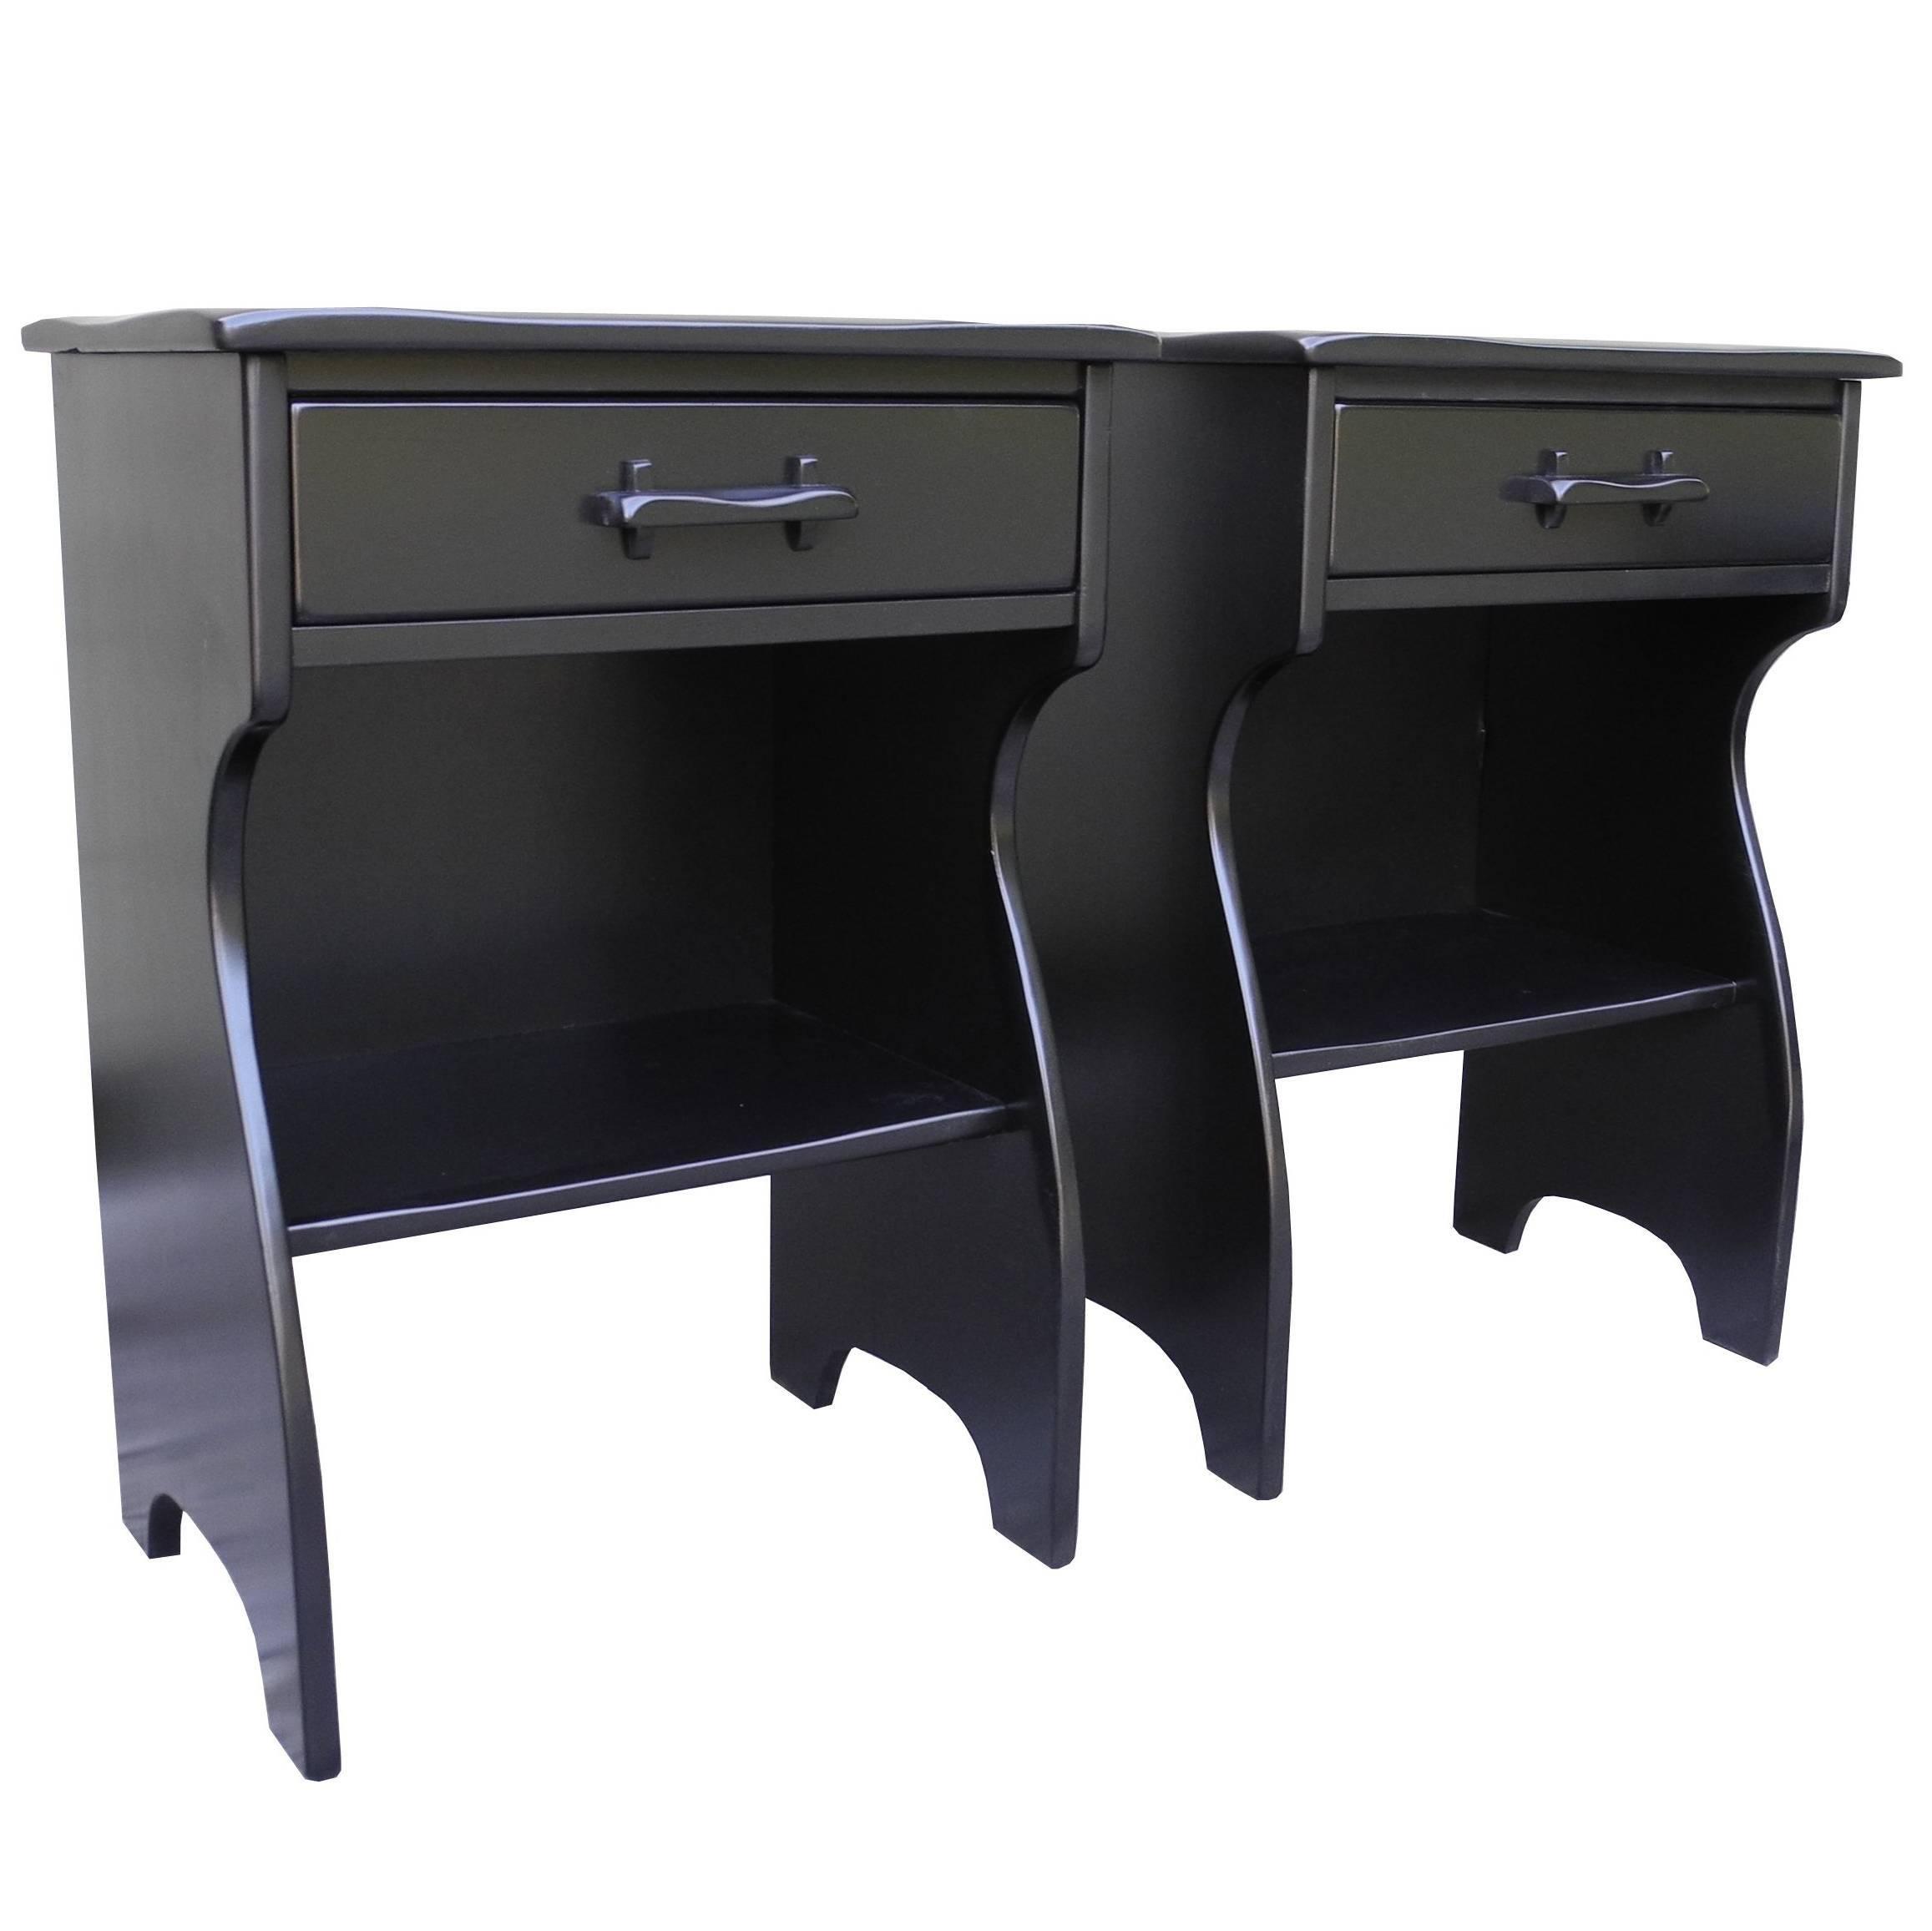 Marvelous Mid Century Colonial Modern Maple Nightstands In Black By Cushman Furniture  1